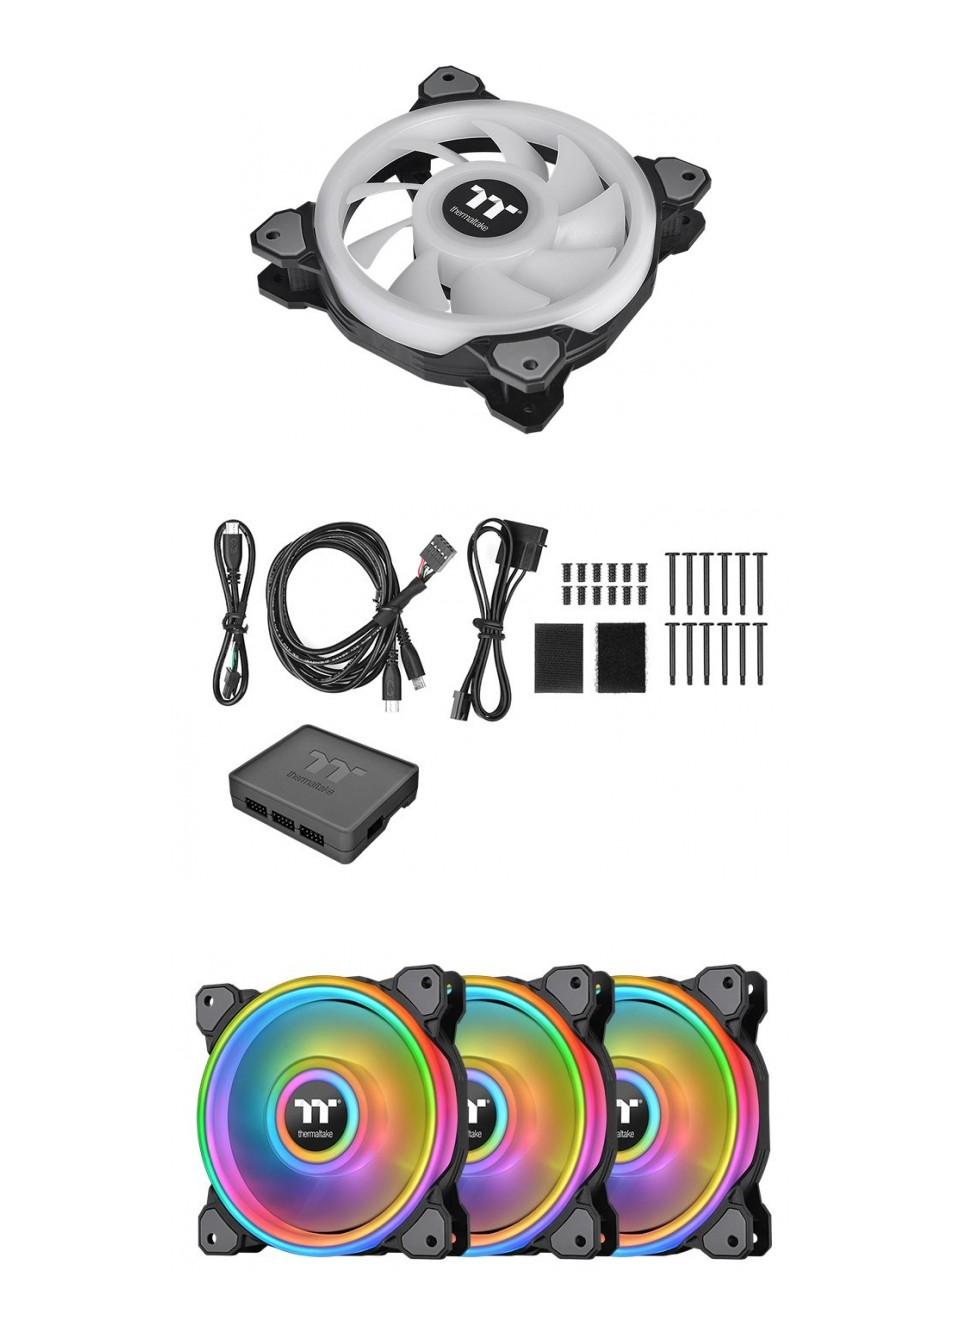 Thermaltake Riing Quad 12 RGB Radiator 120MM Fan 3 Pack Black product